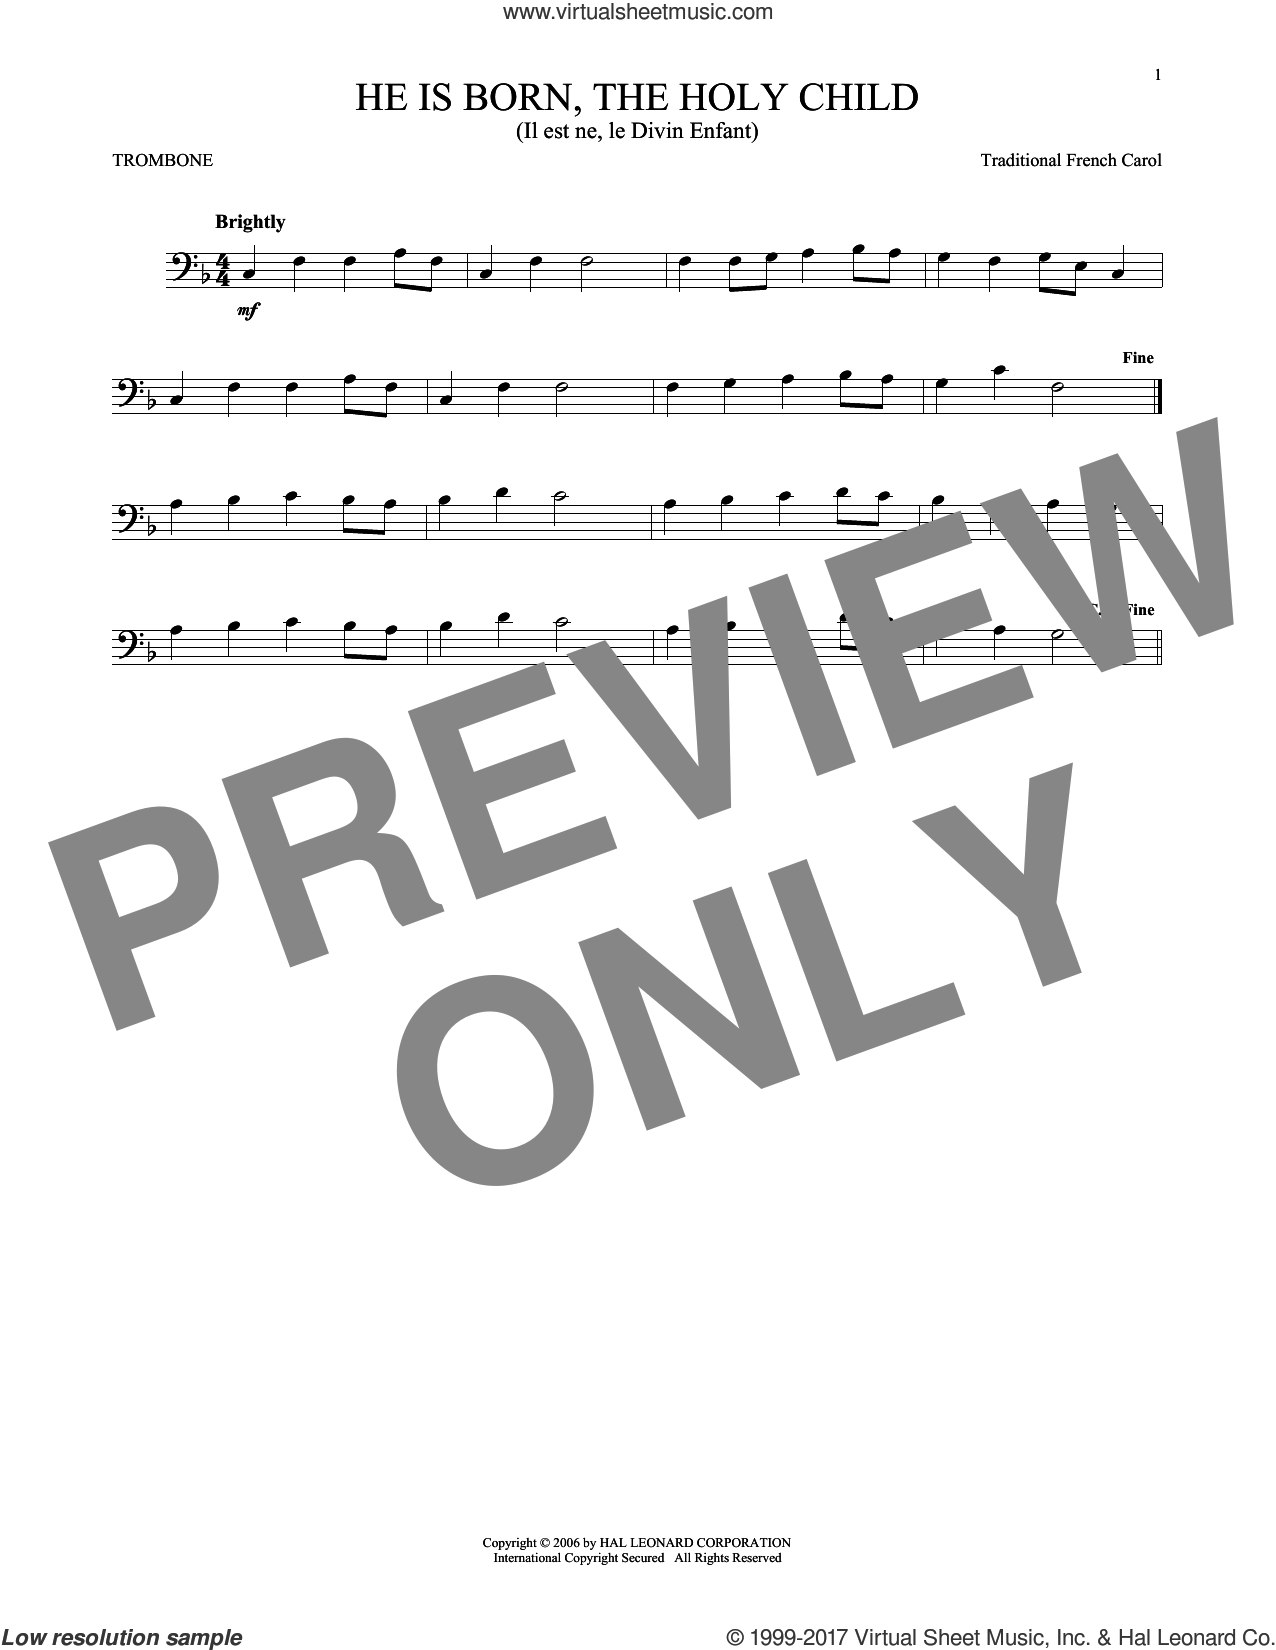 He Is Born, The Holy Child (Il Est Ne, Le Divin Enfant) sheet music for trombone solo, intermediate skill level